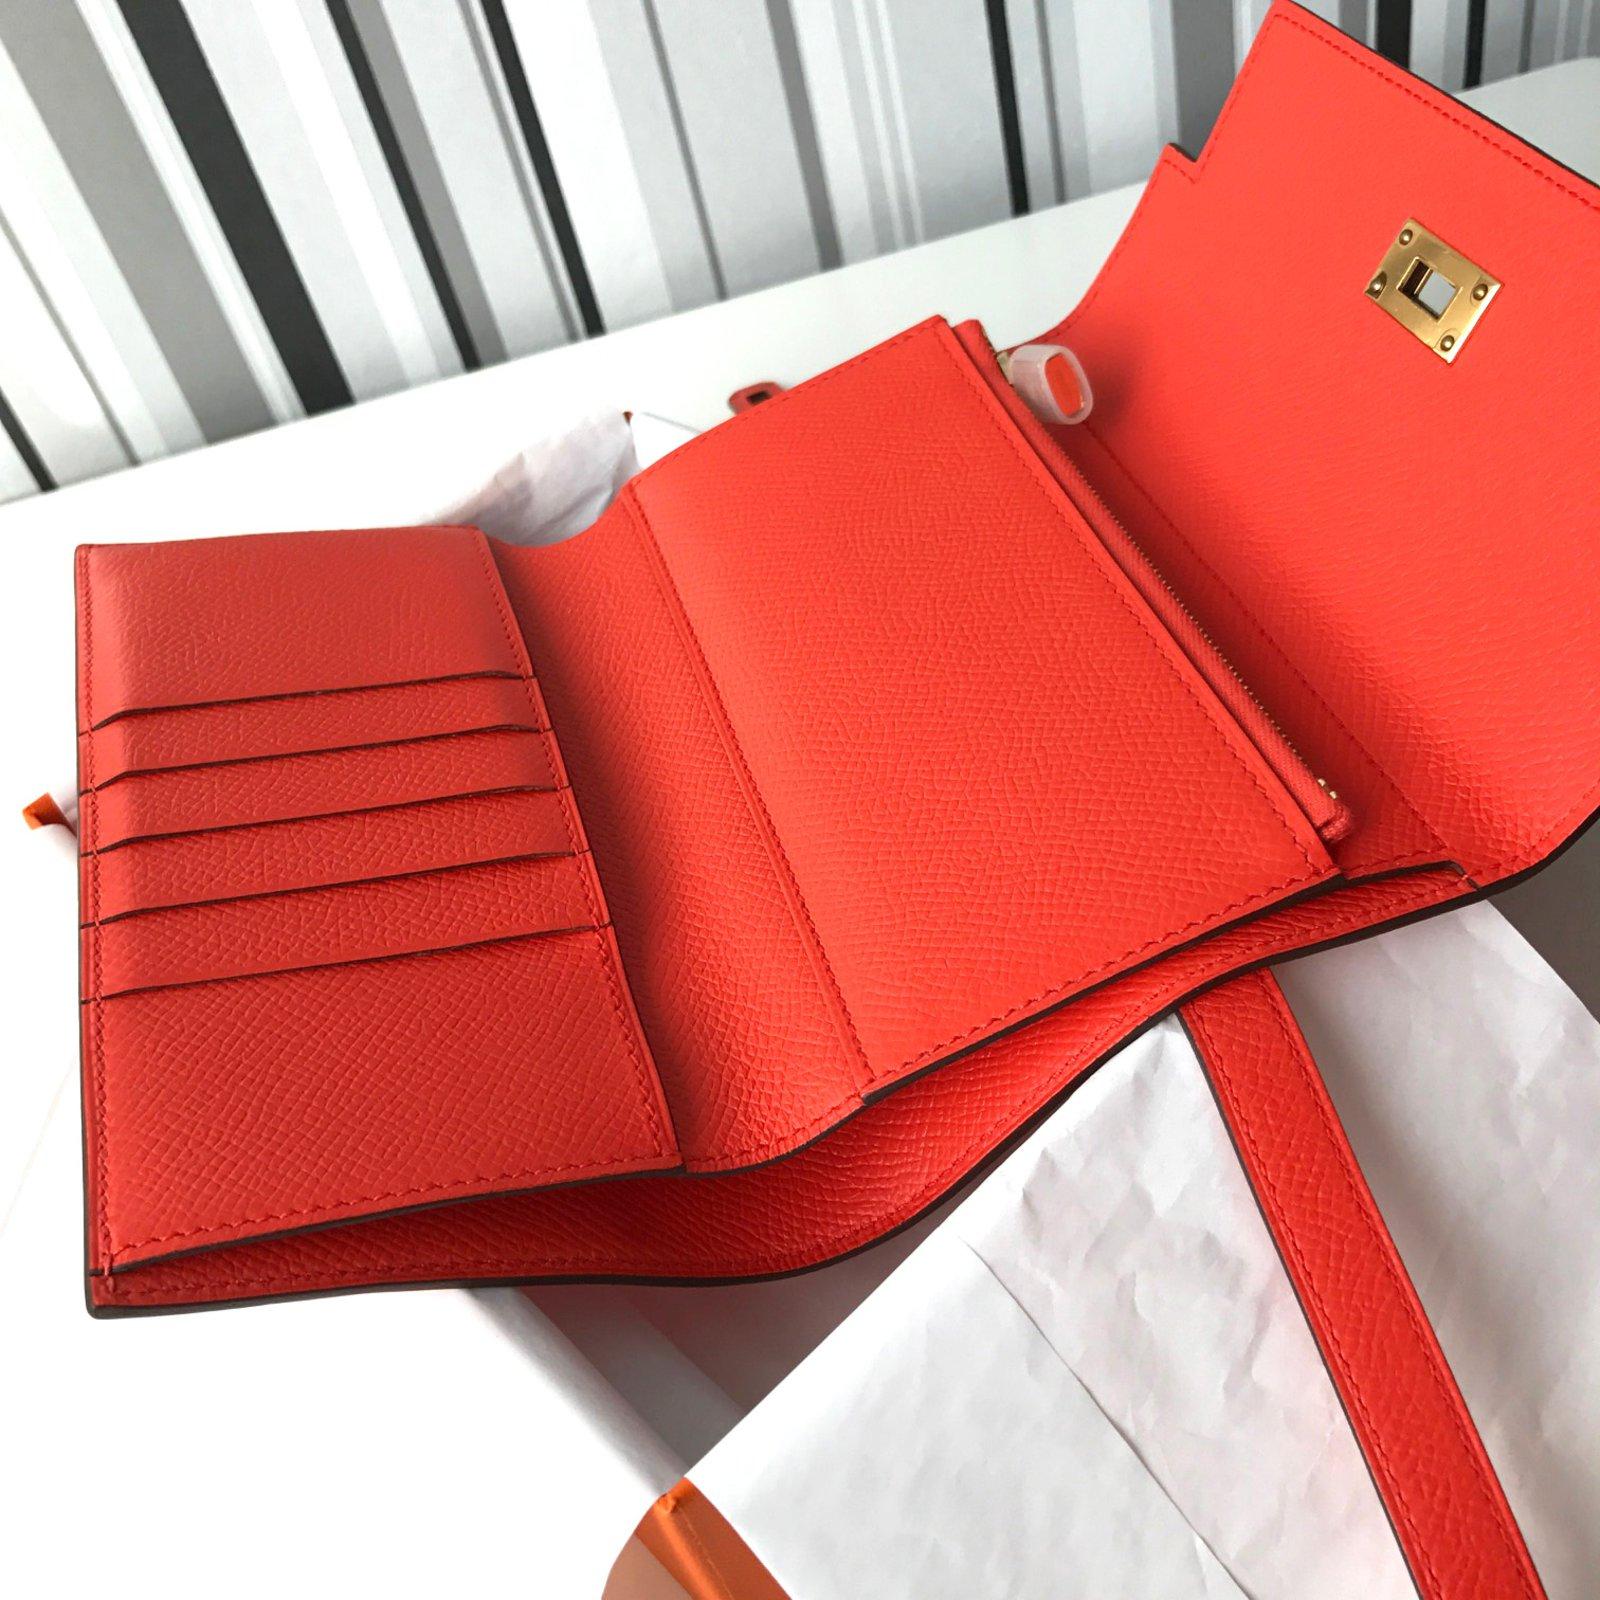 bd66e1d2511e Hermès Kelly compact wallet Wallets Leather Orange ref.27771 - Joli ...